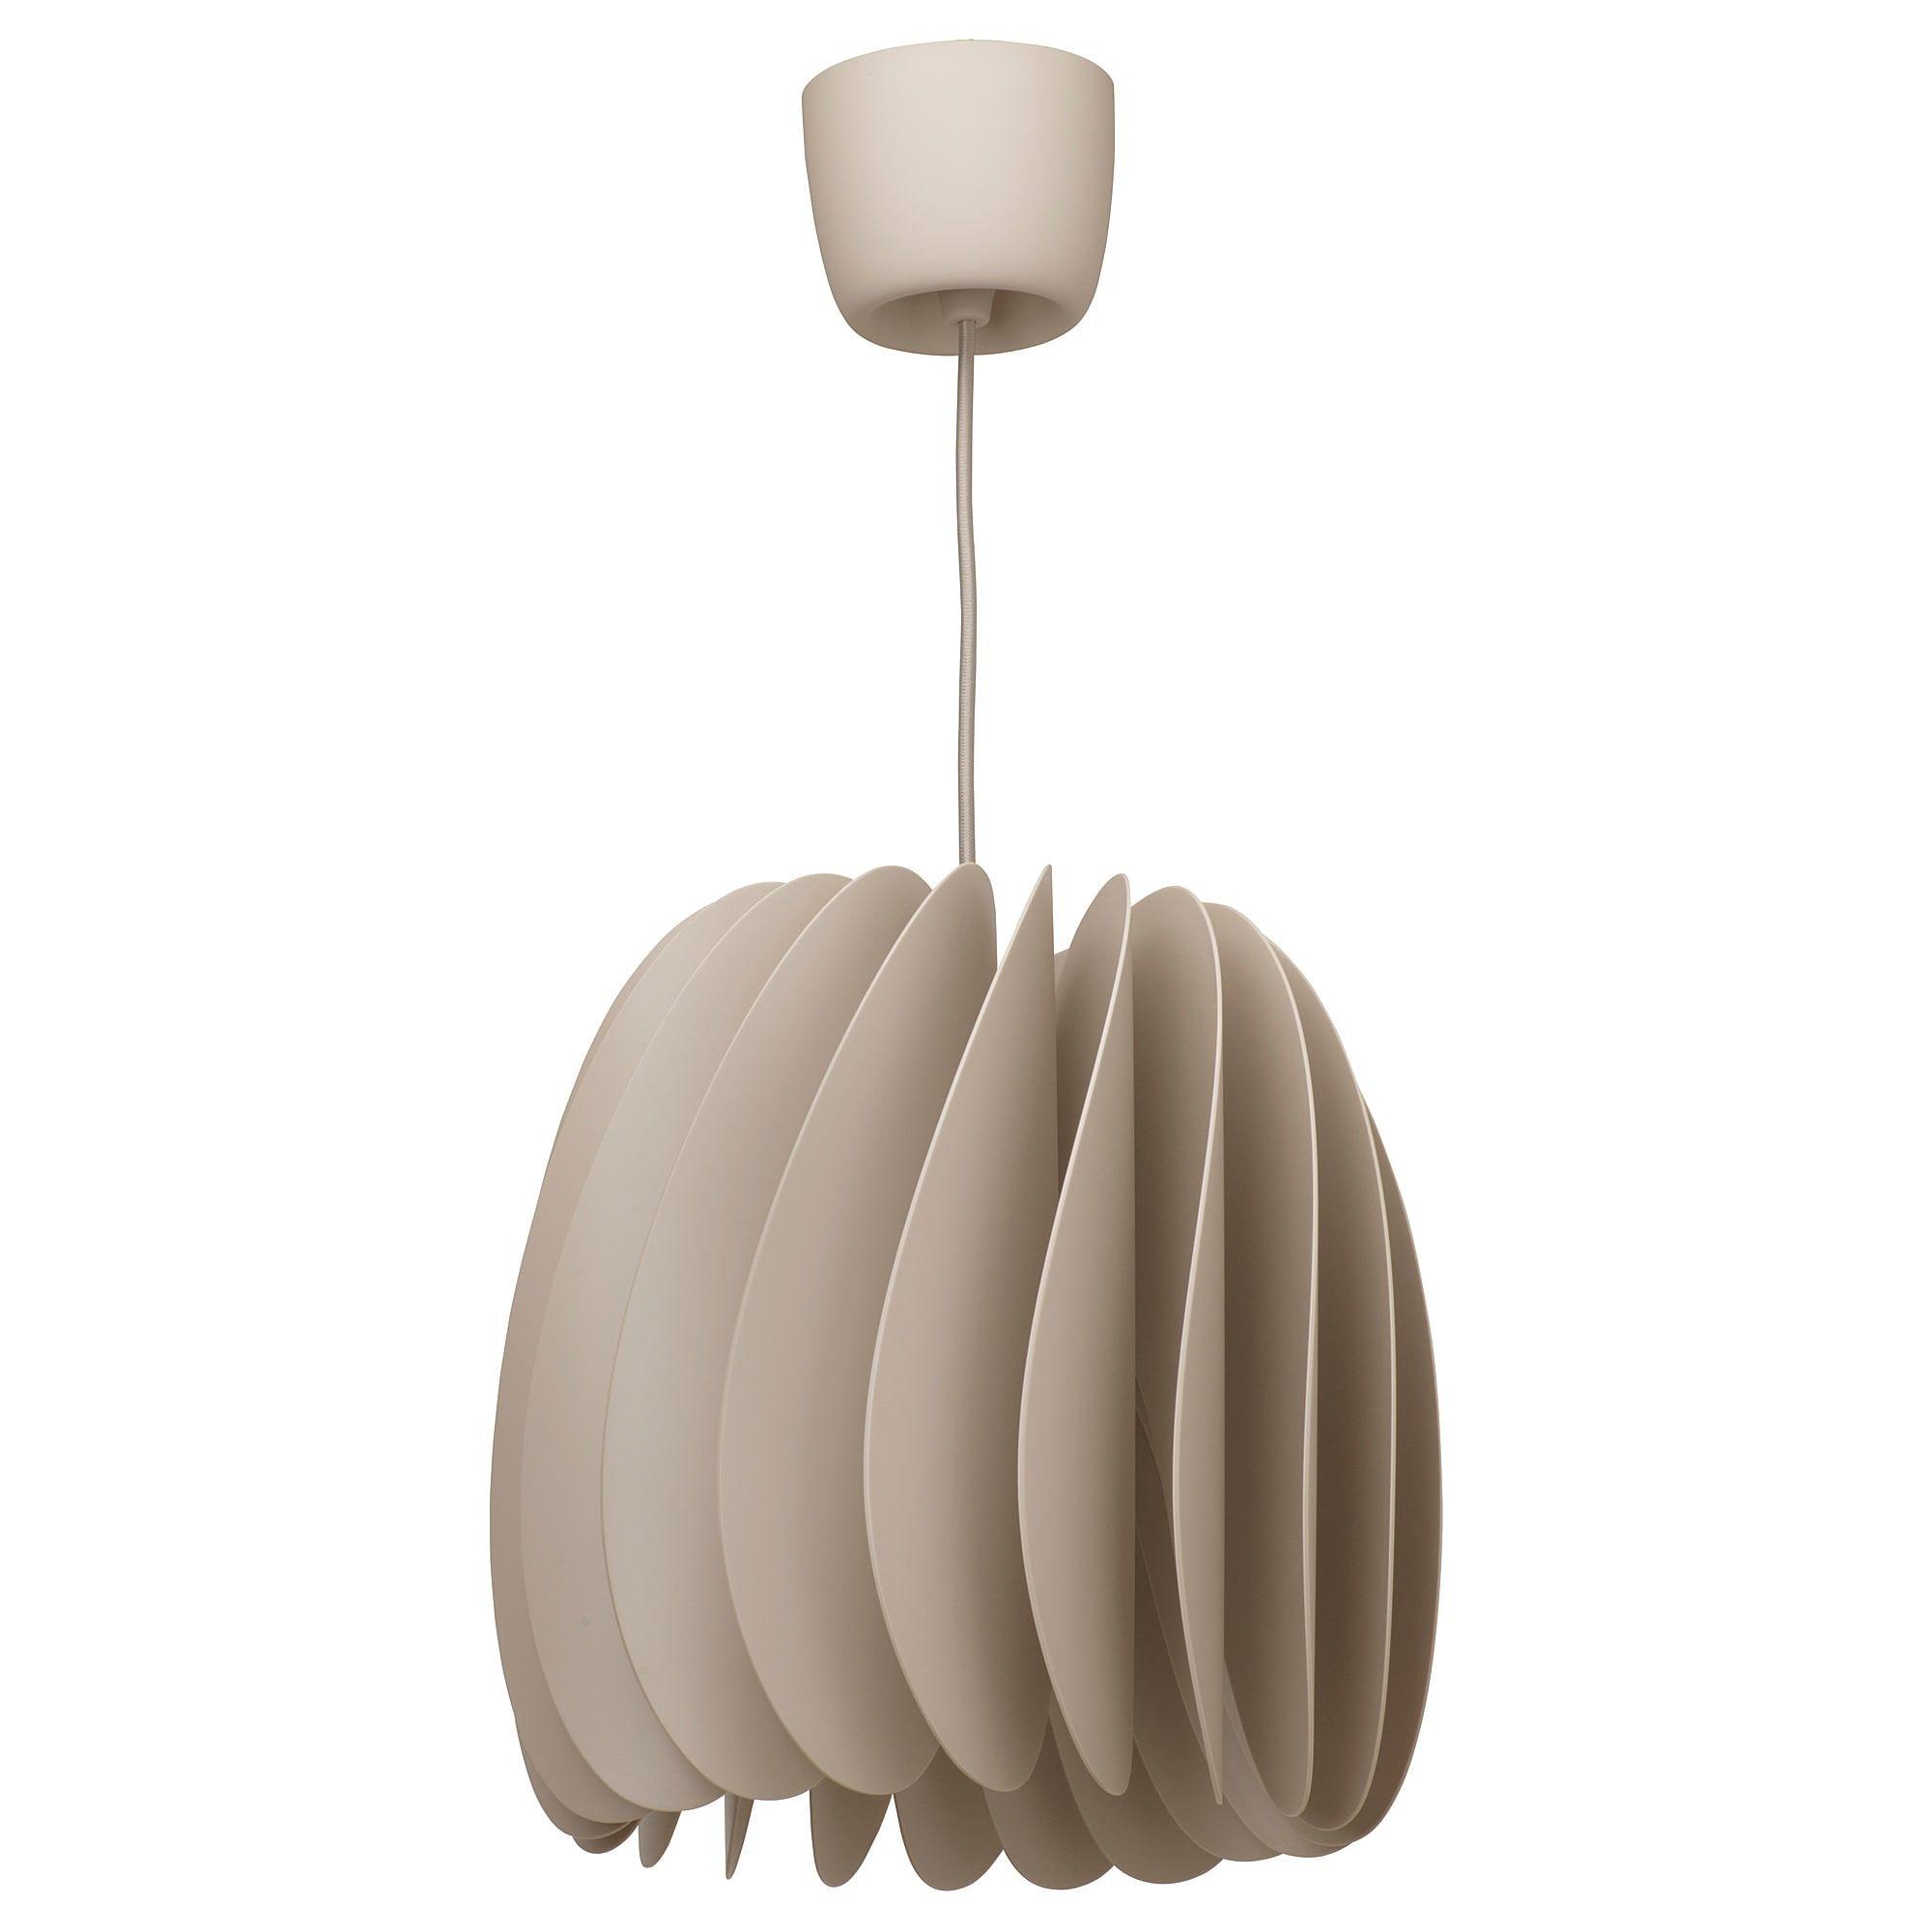 Ikea Skymningen Beige Pendant Lamp Pendant Lamp Ikea Lamp Ceiling Lamp